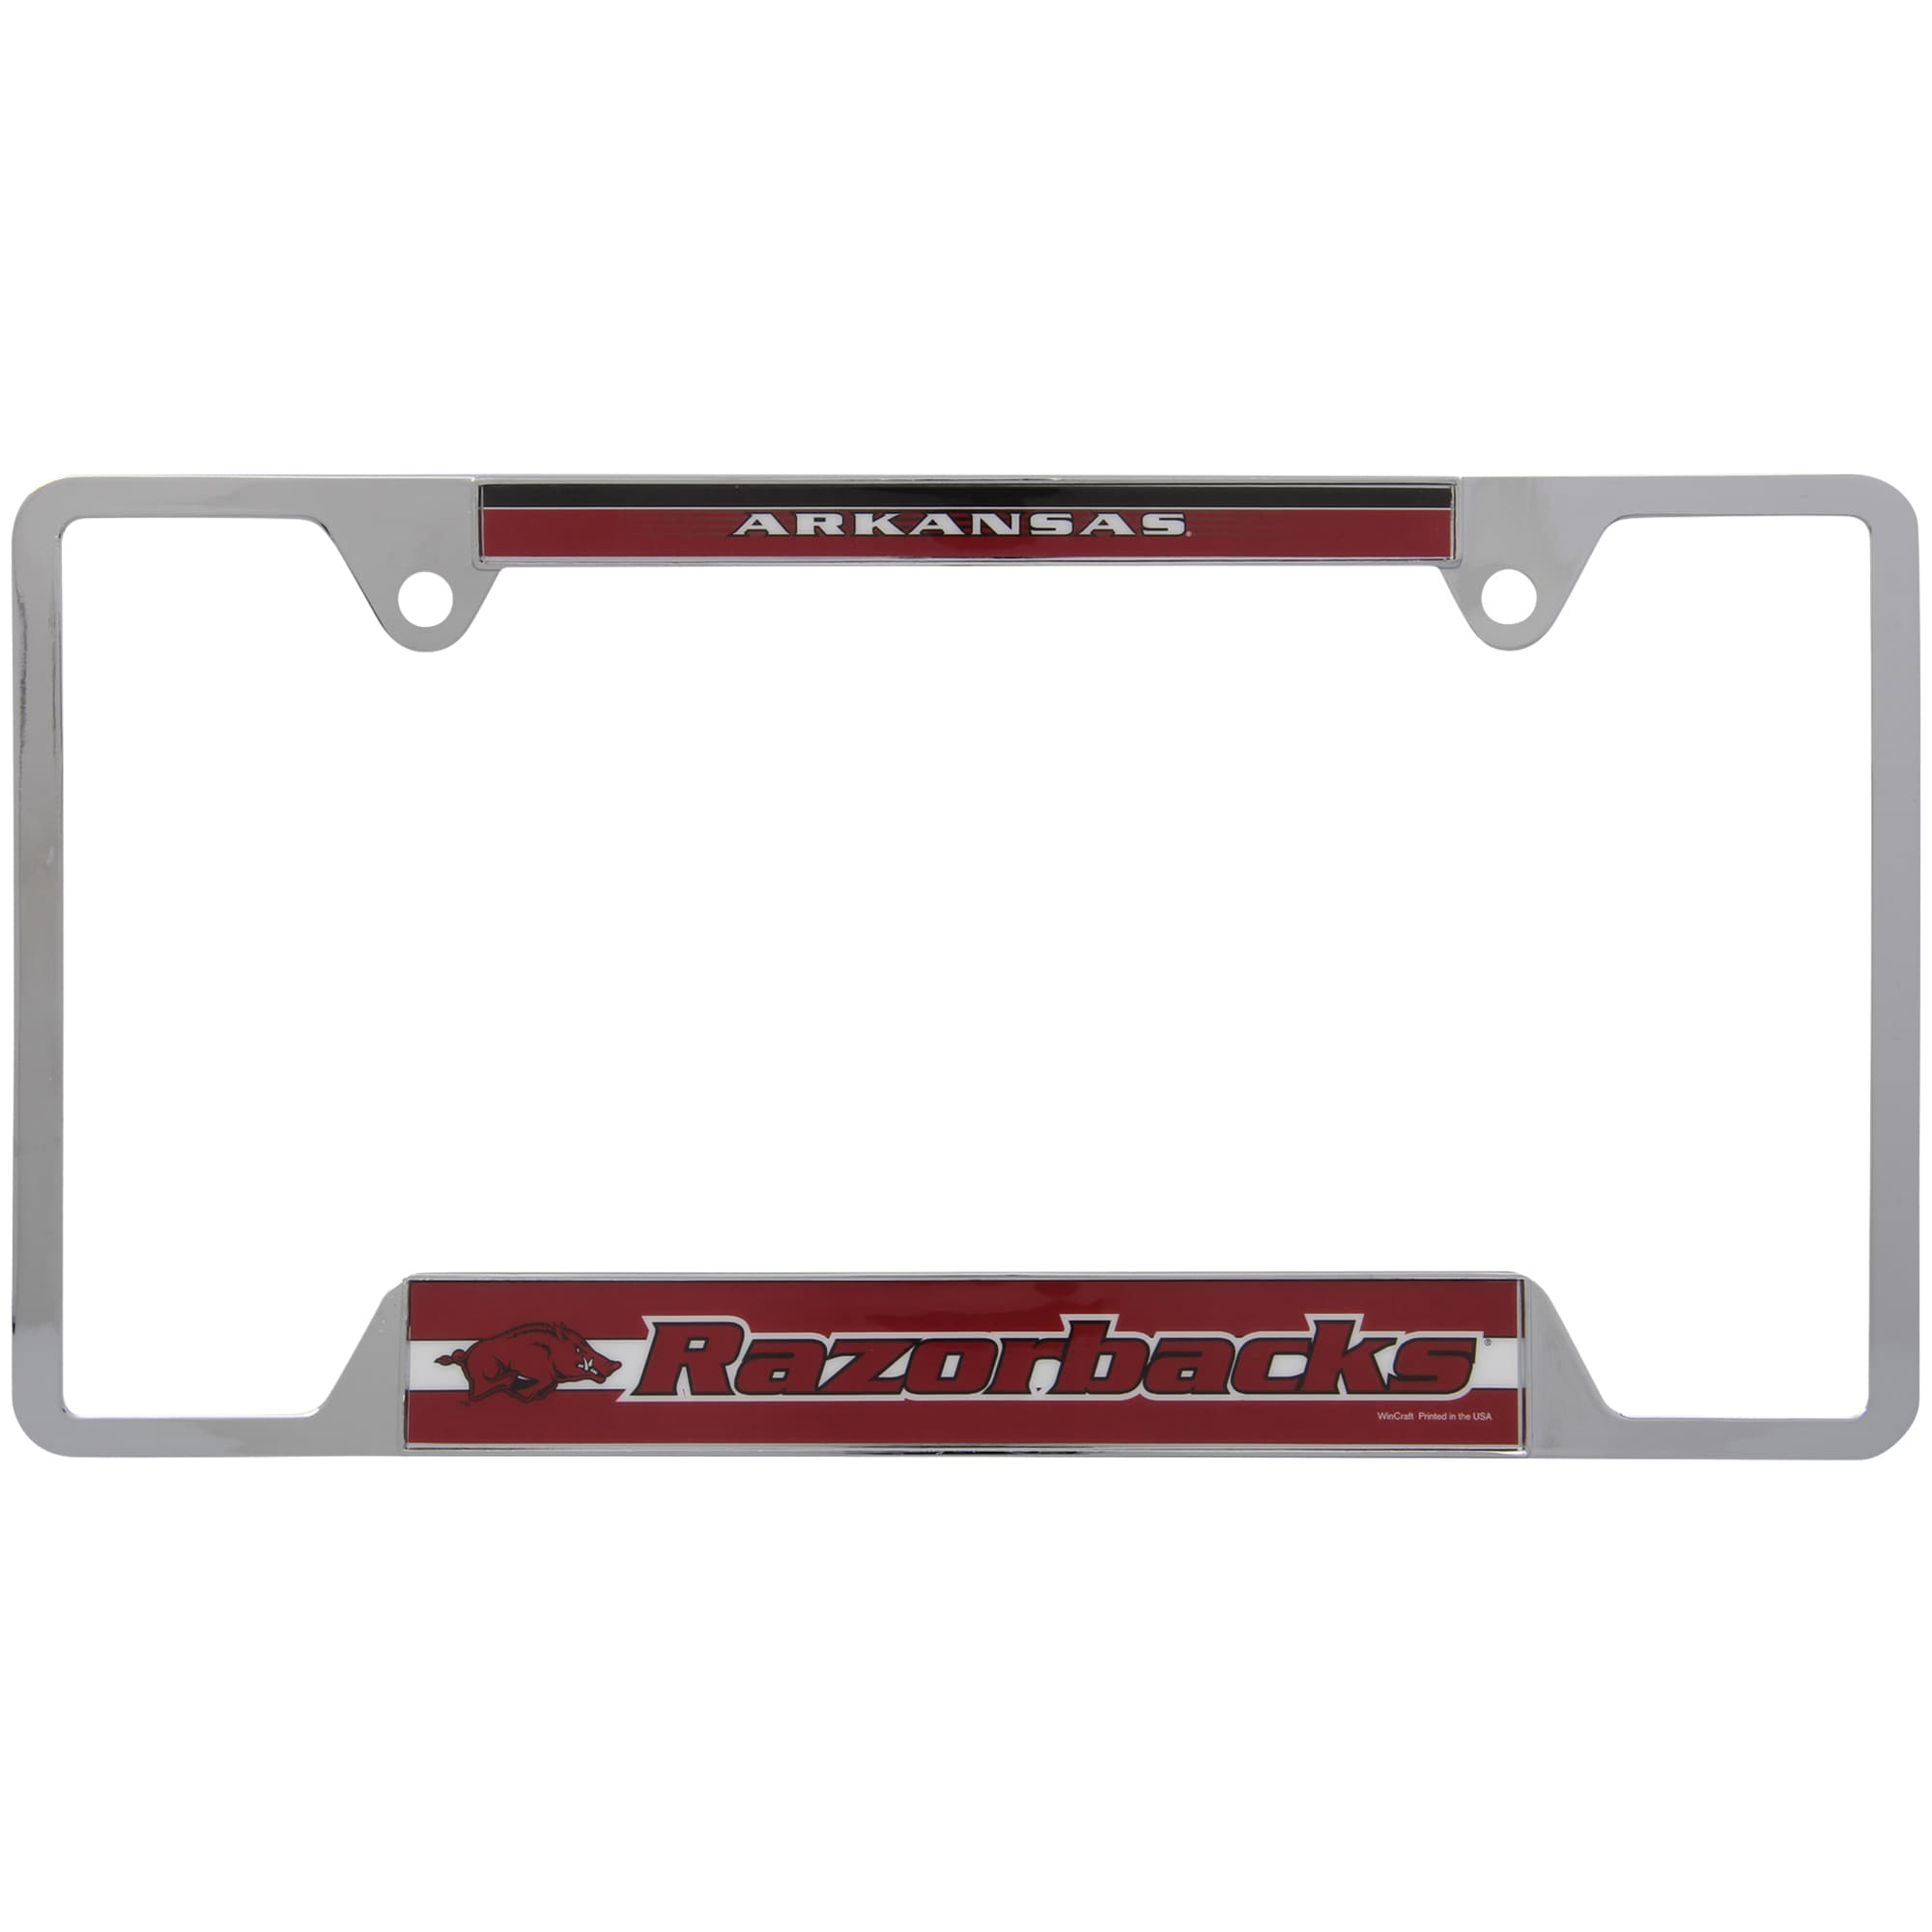 Arkansas Razorbacks Auto License Plate Frame